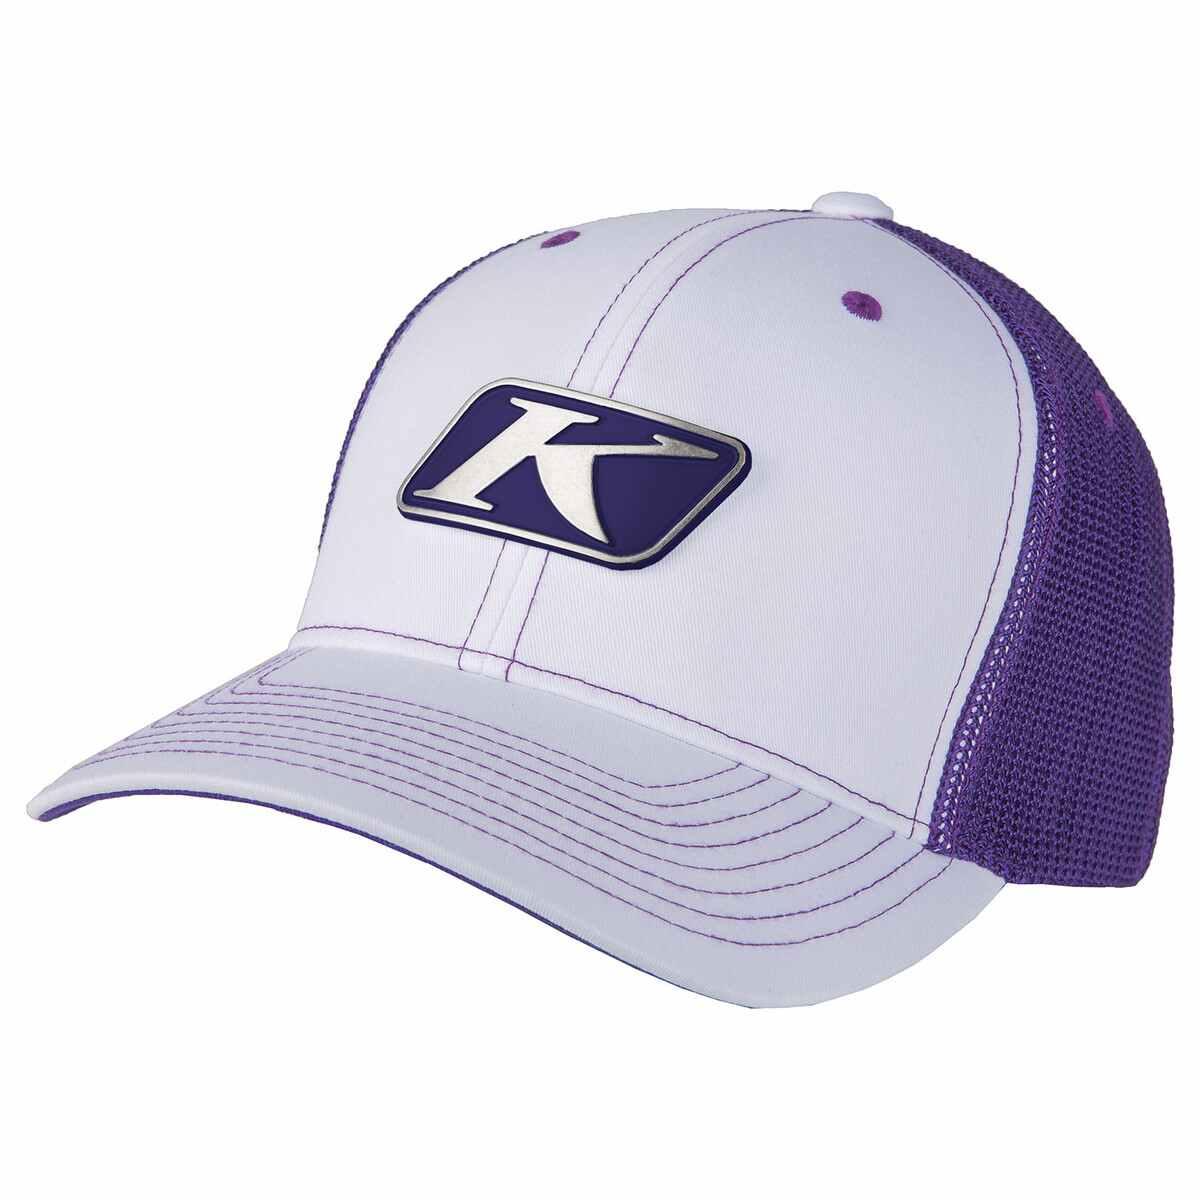 Icon Snap Hat White & Deep Purple